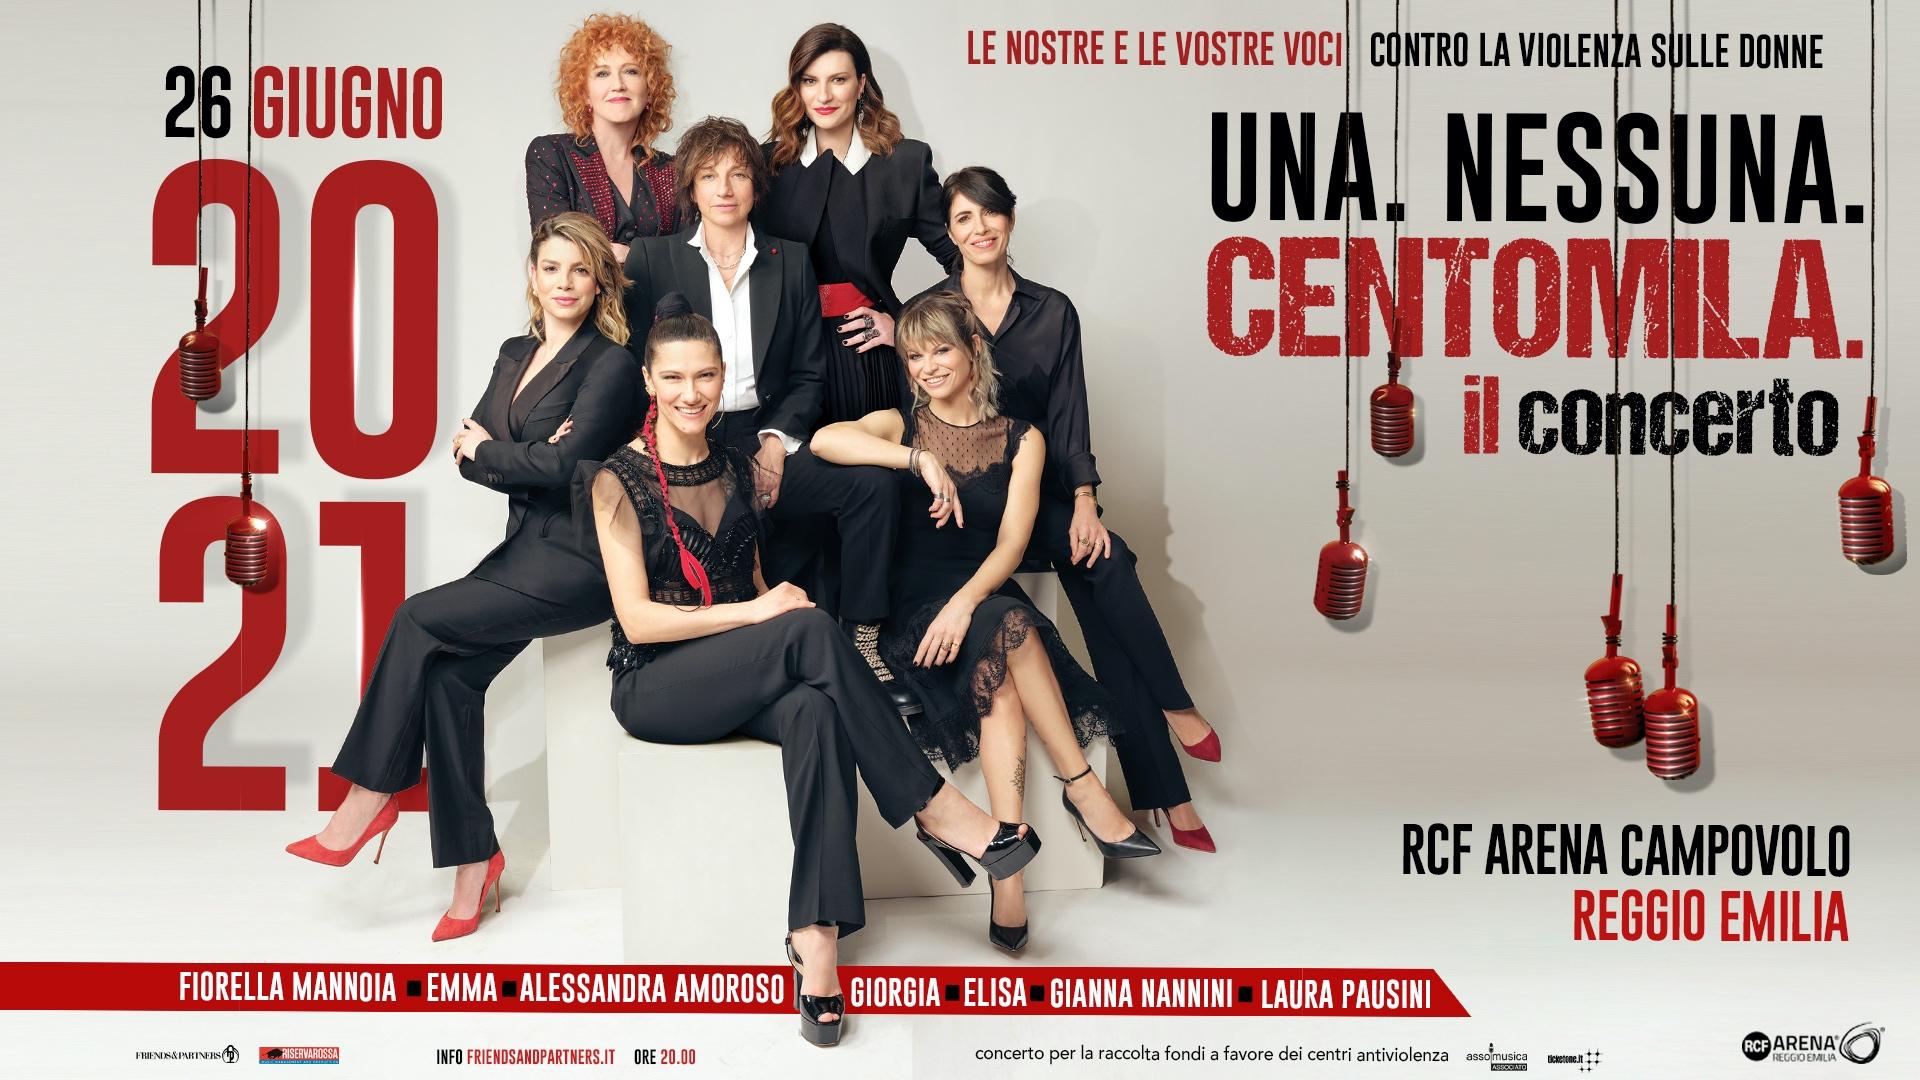 Una. Nessuna. Centomila. The Concert: postponed to June 26, 2021